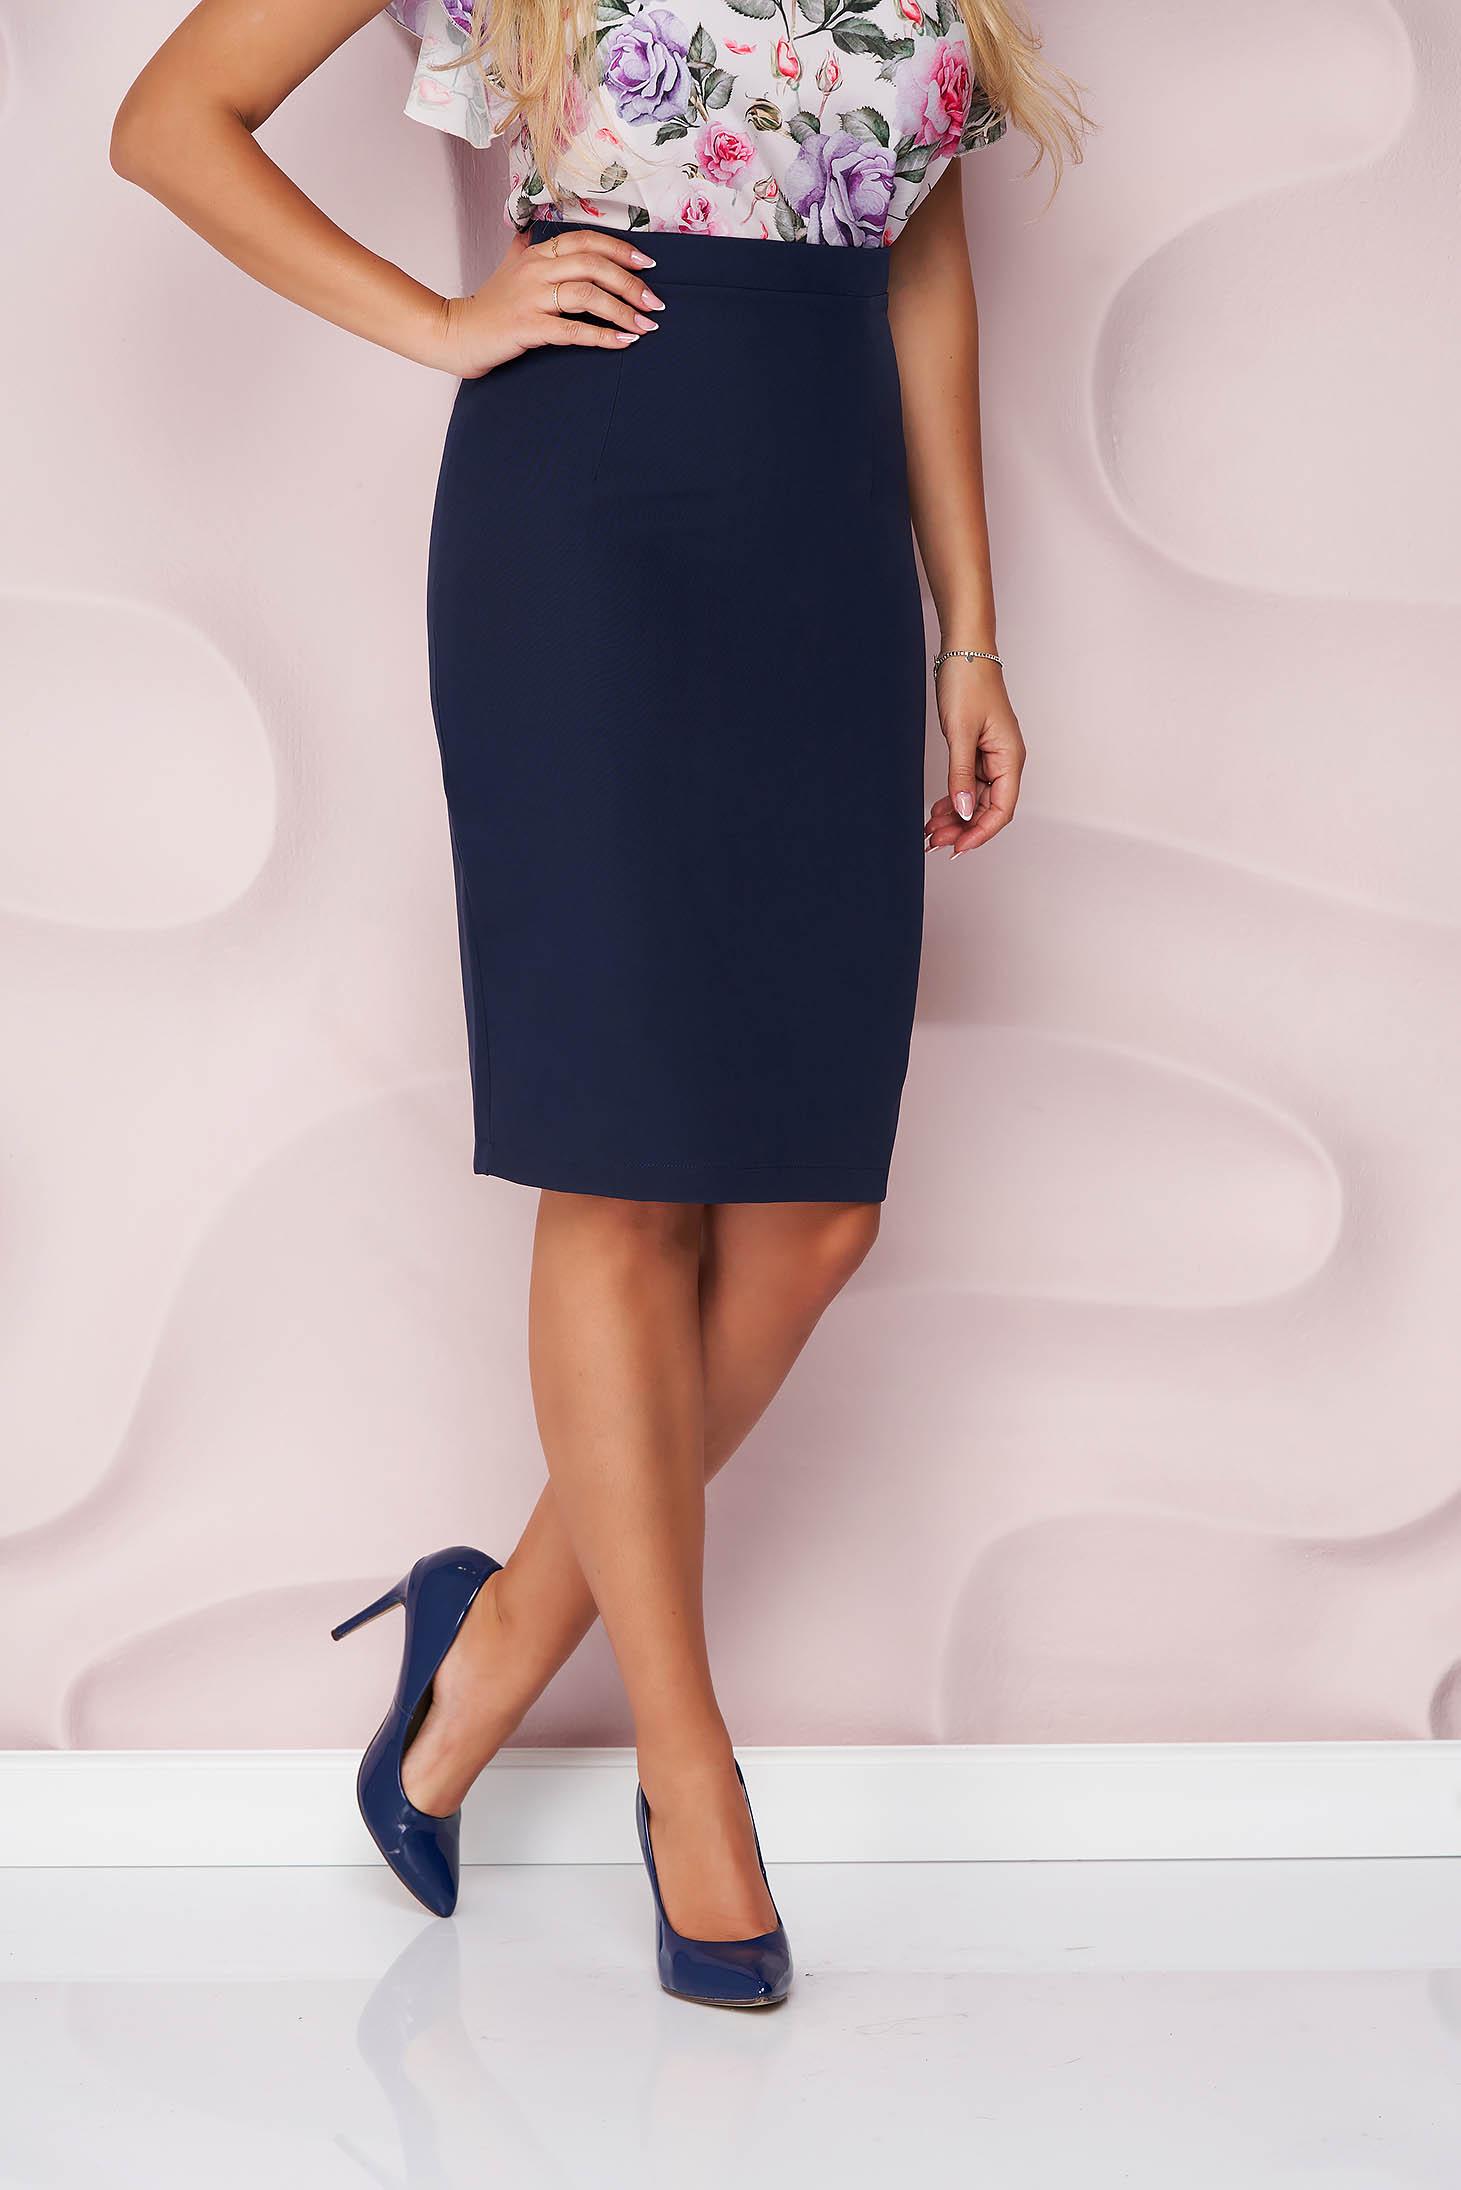 StarShinerS darkblue high waisted office pencil skirt slightly elastic fabric